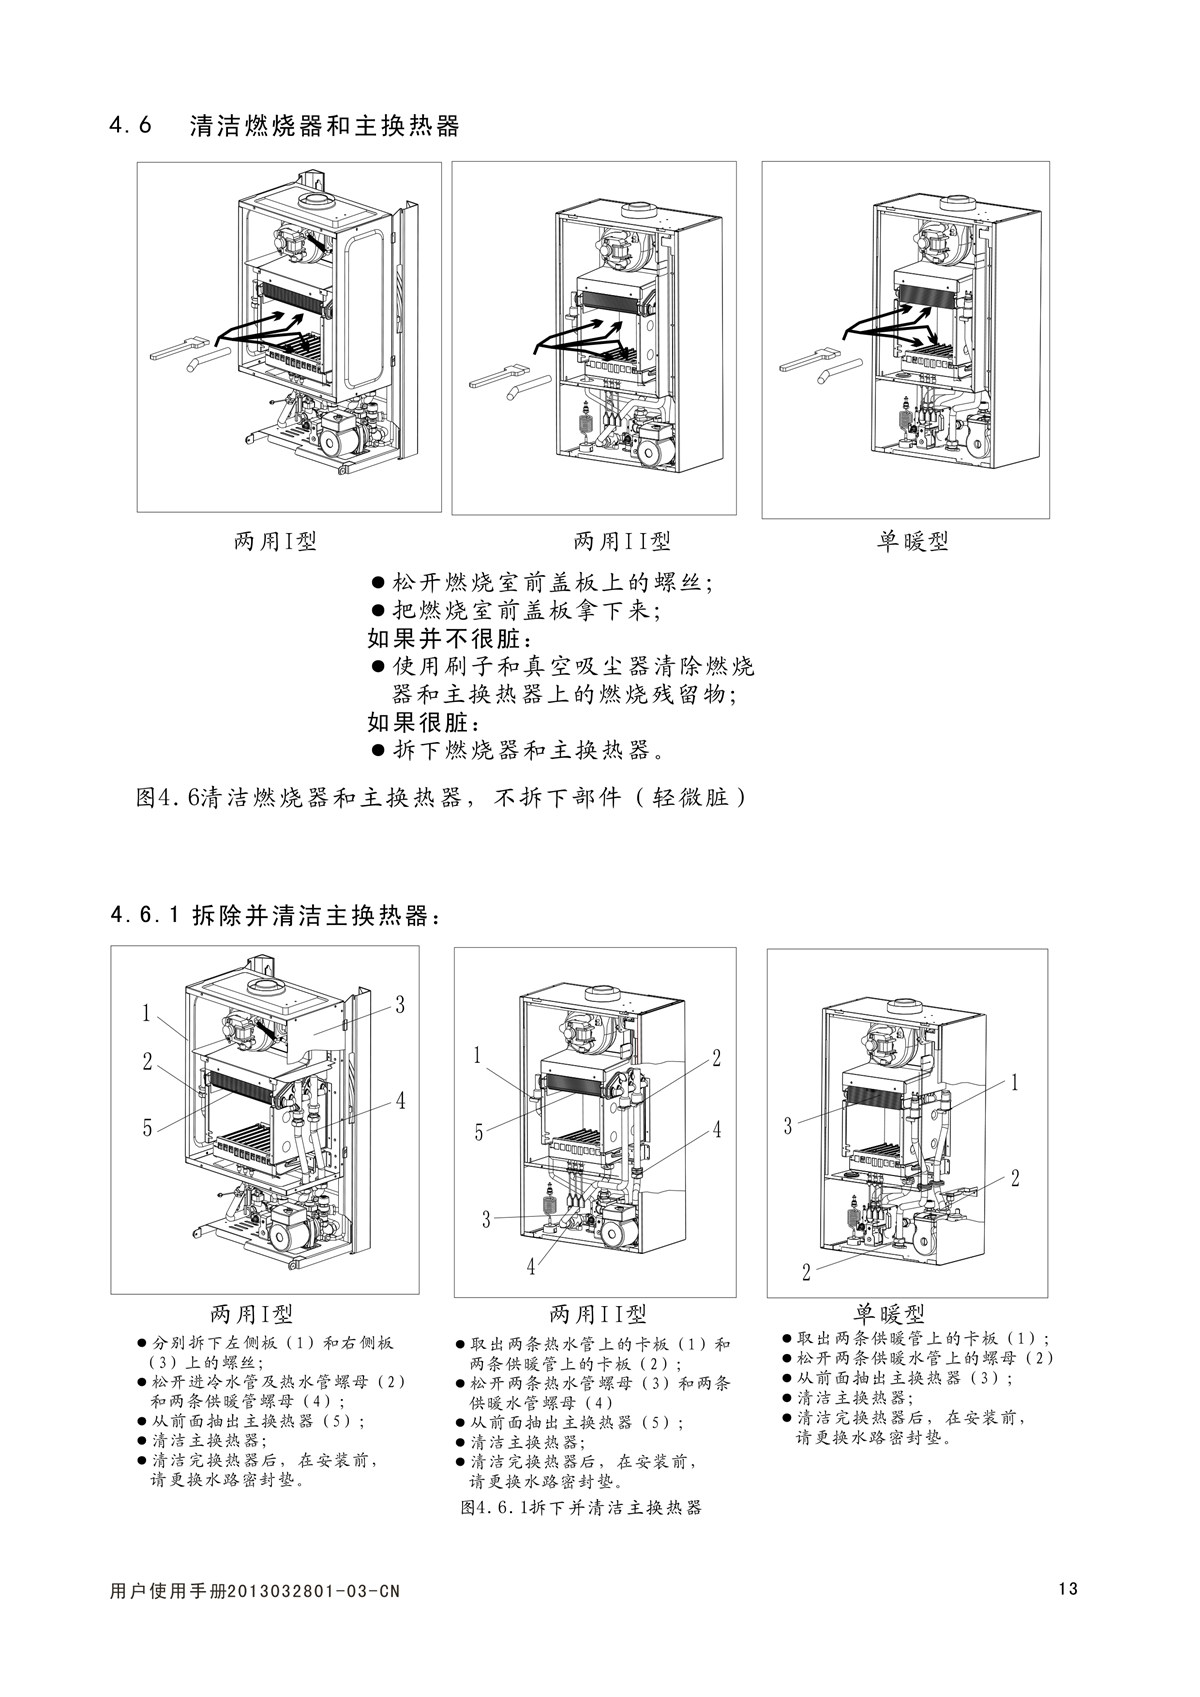 ES02系列-用户使用手册-5_02.jpg